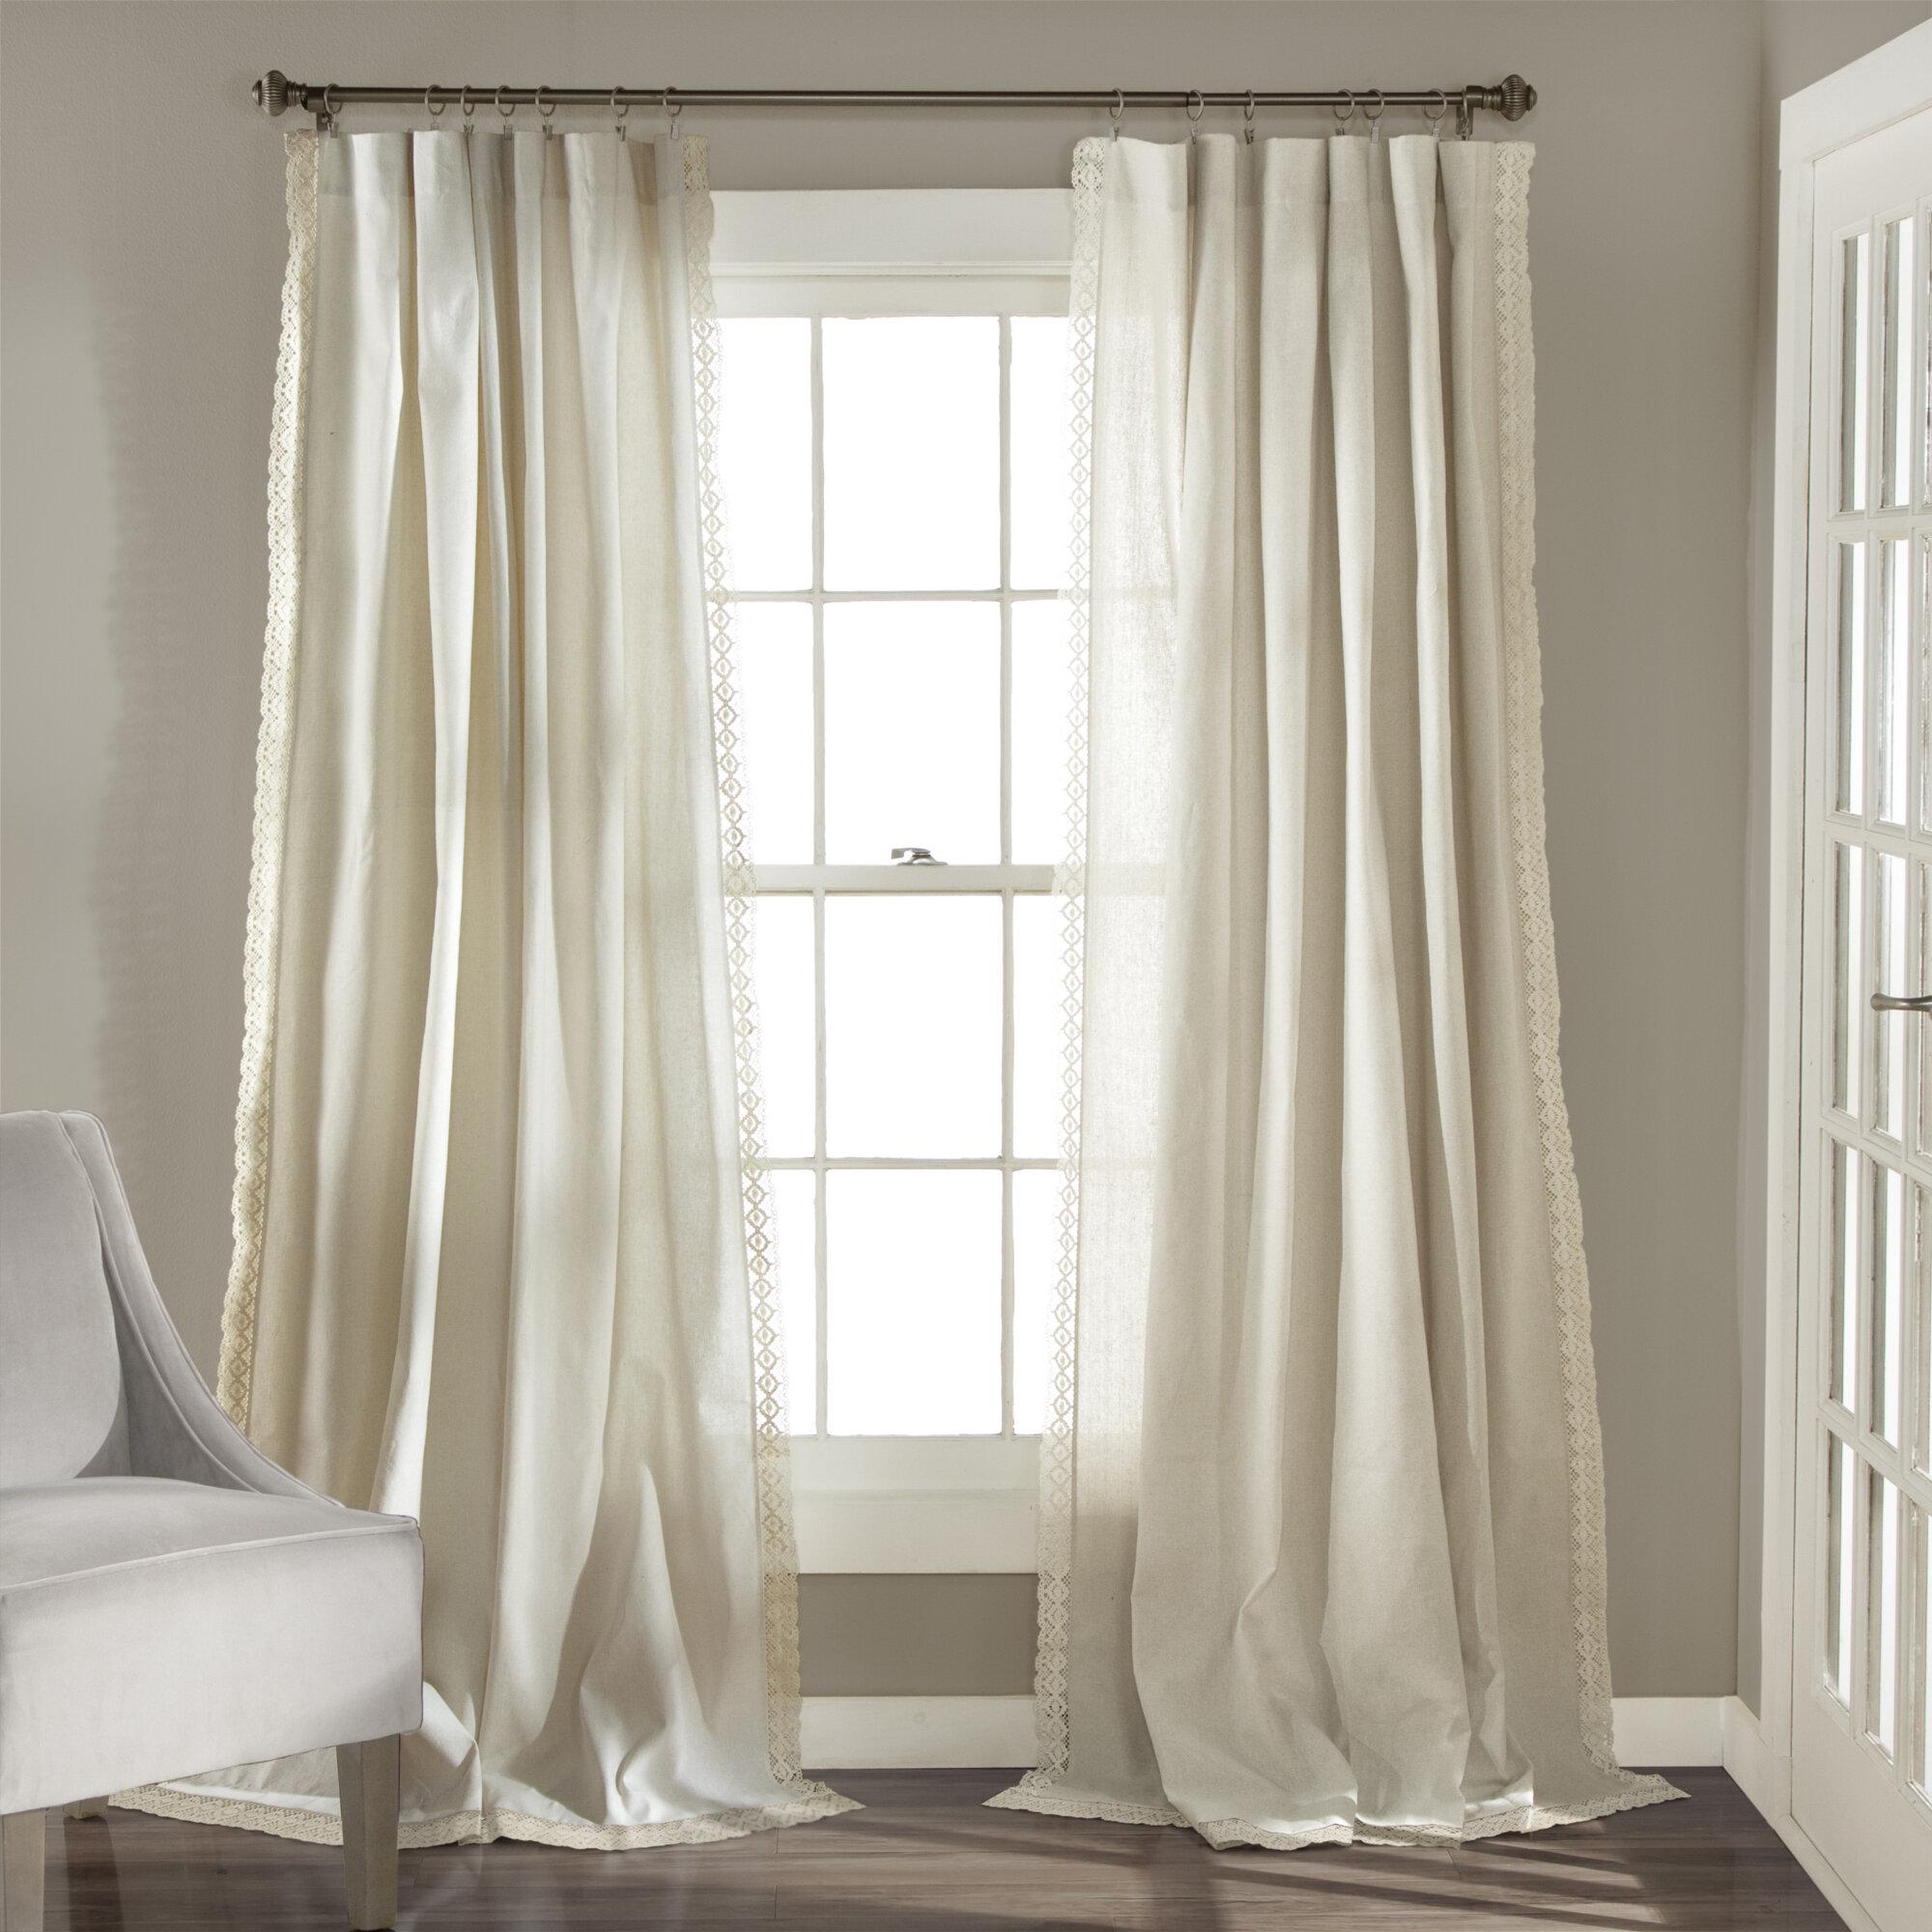 Panel Pair Laurel Foundry Modern Farmhouse Curtains & Drapes You